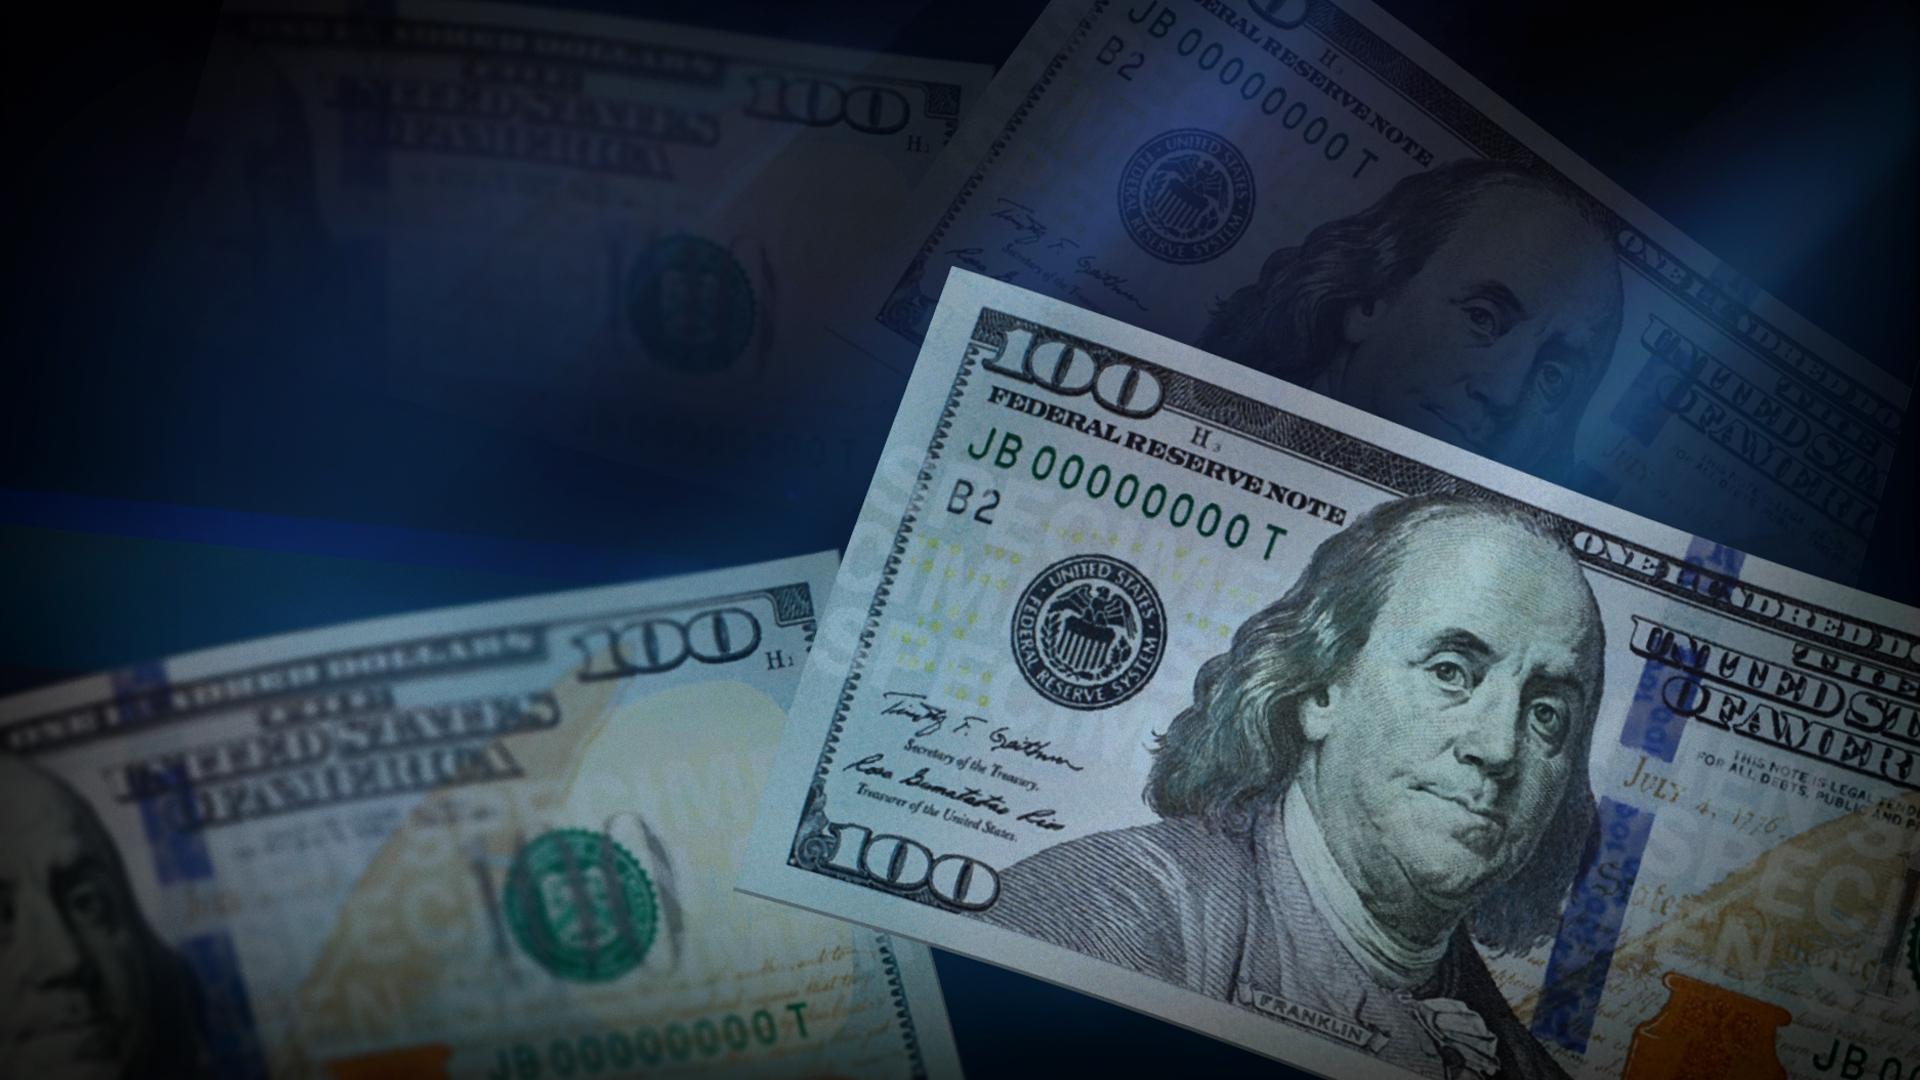 Mixer奖励所有主播100美元鼓励疫情期间居家隔离